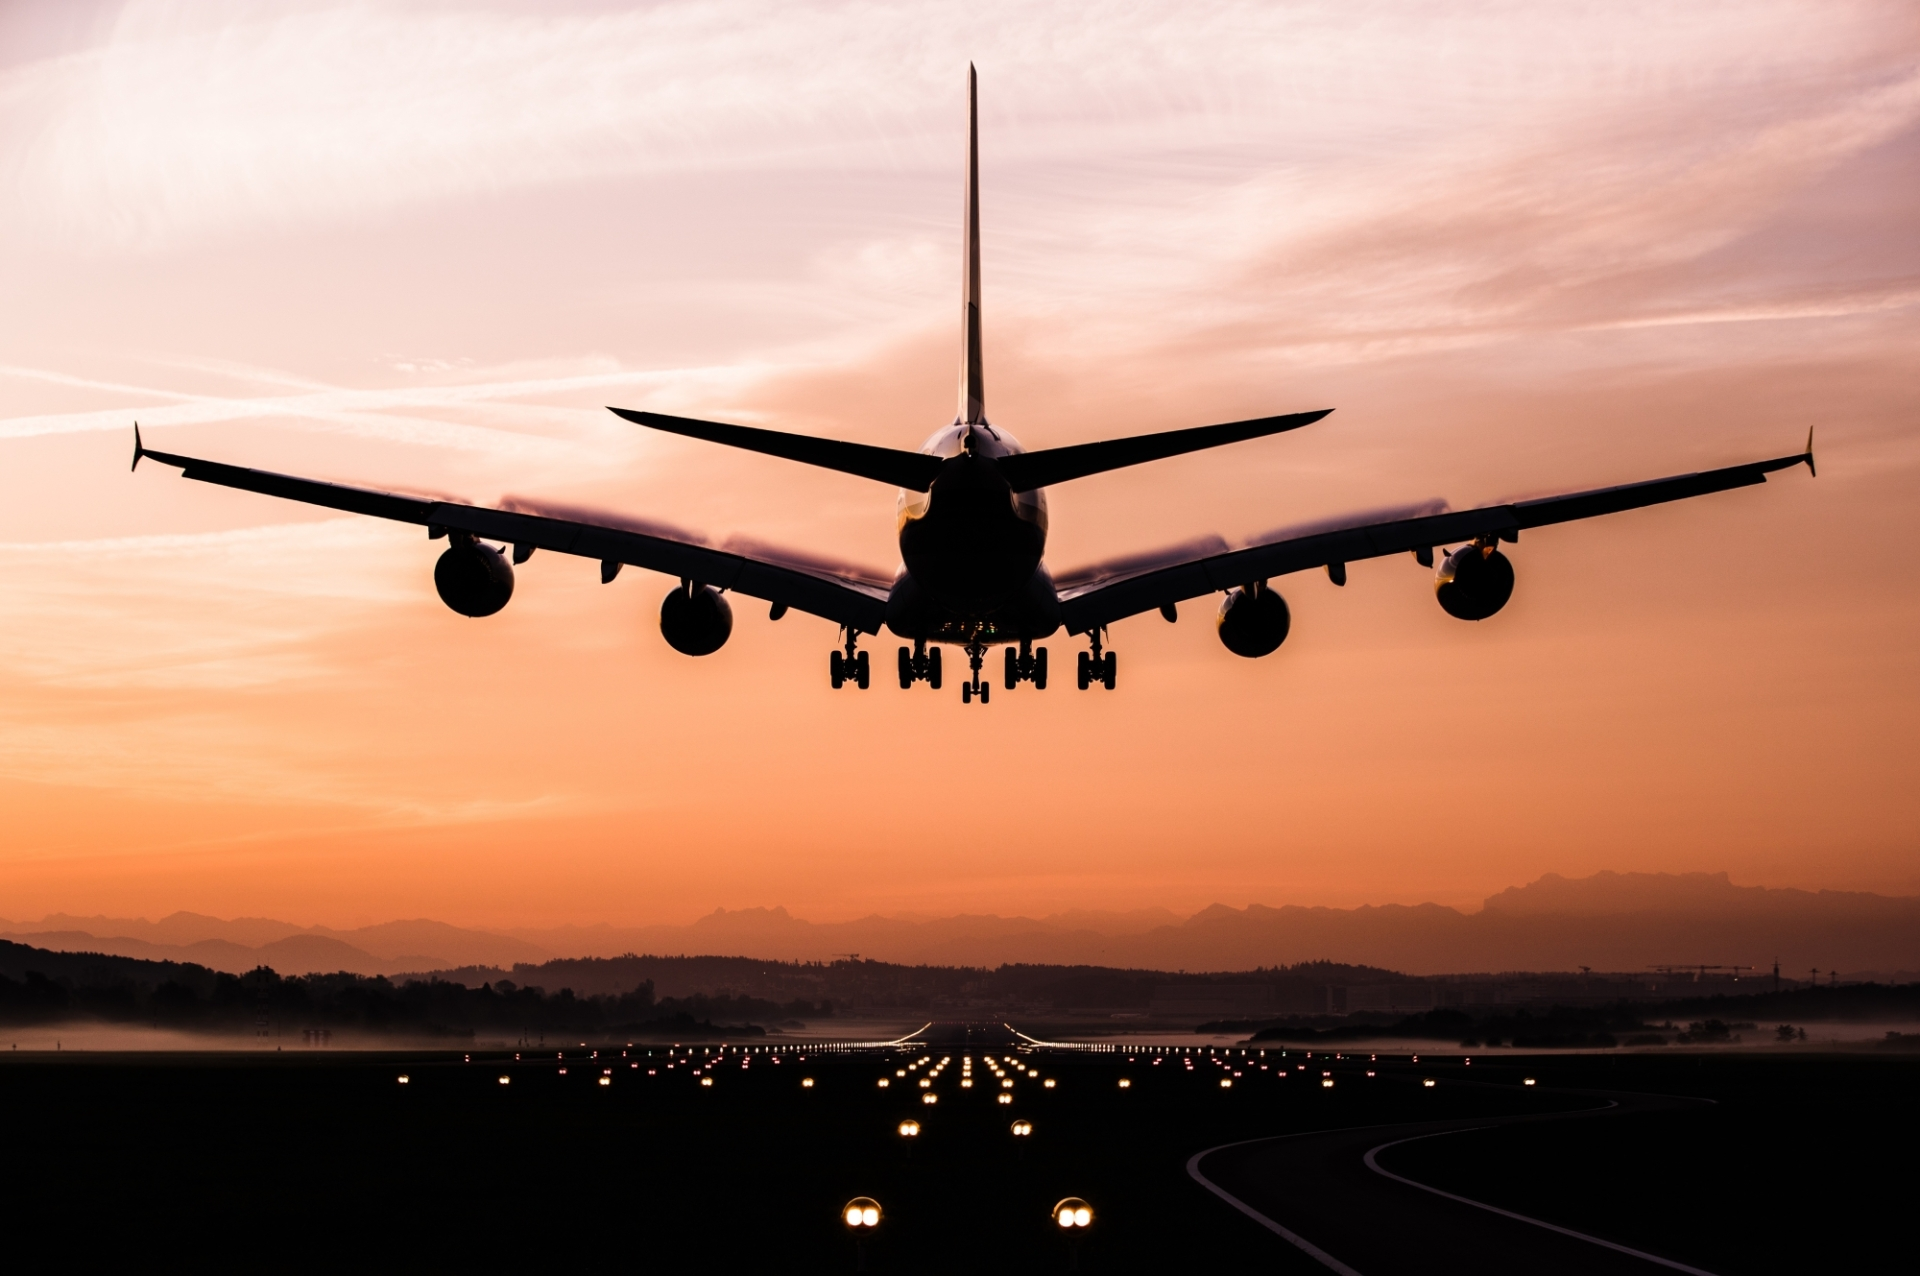 Industry Travel logistics